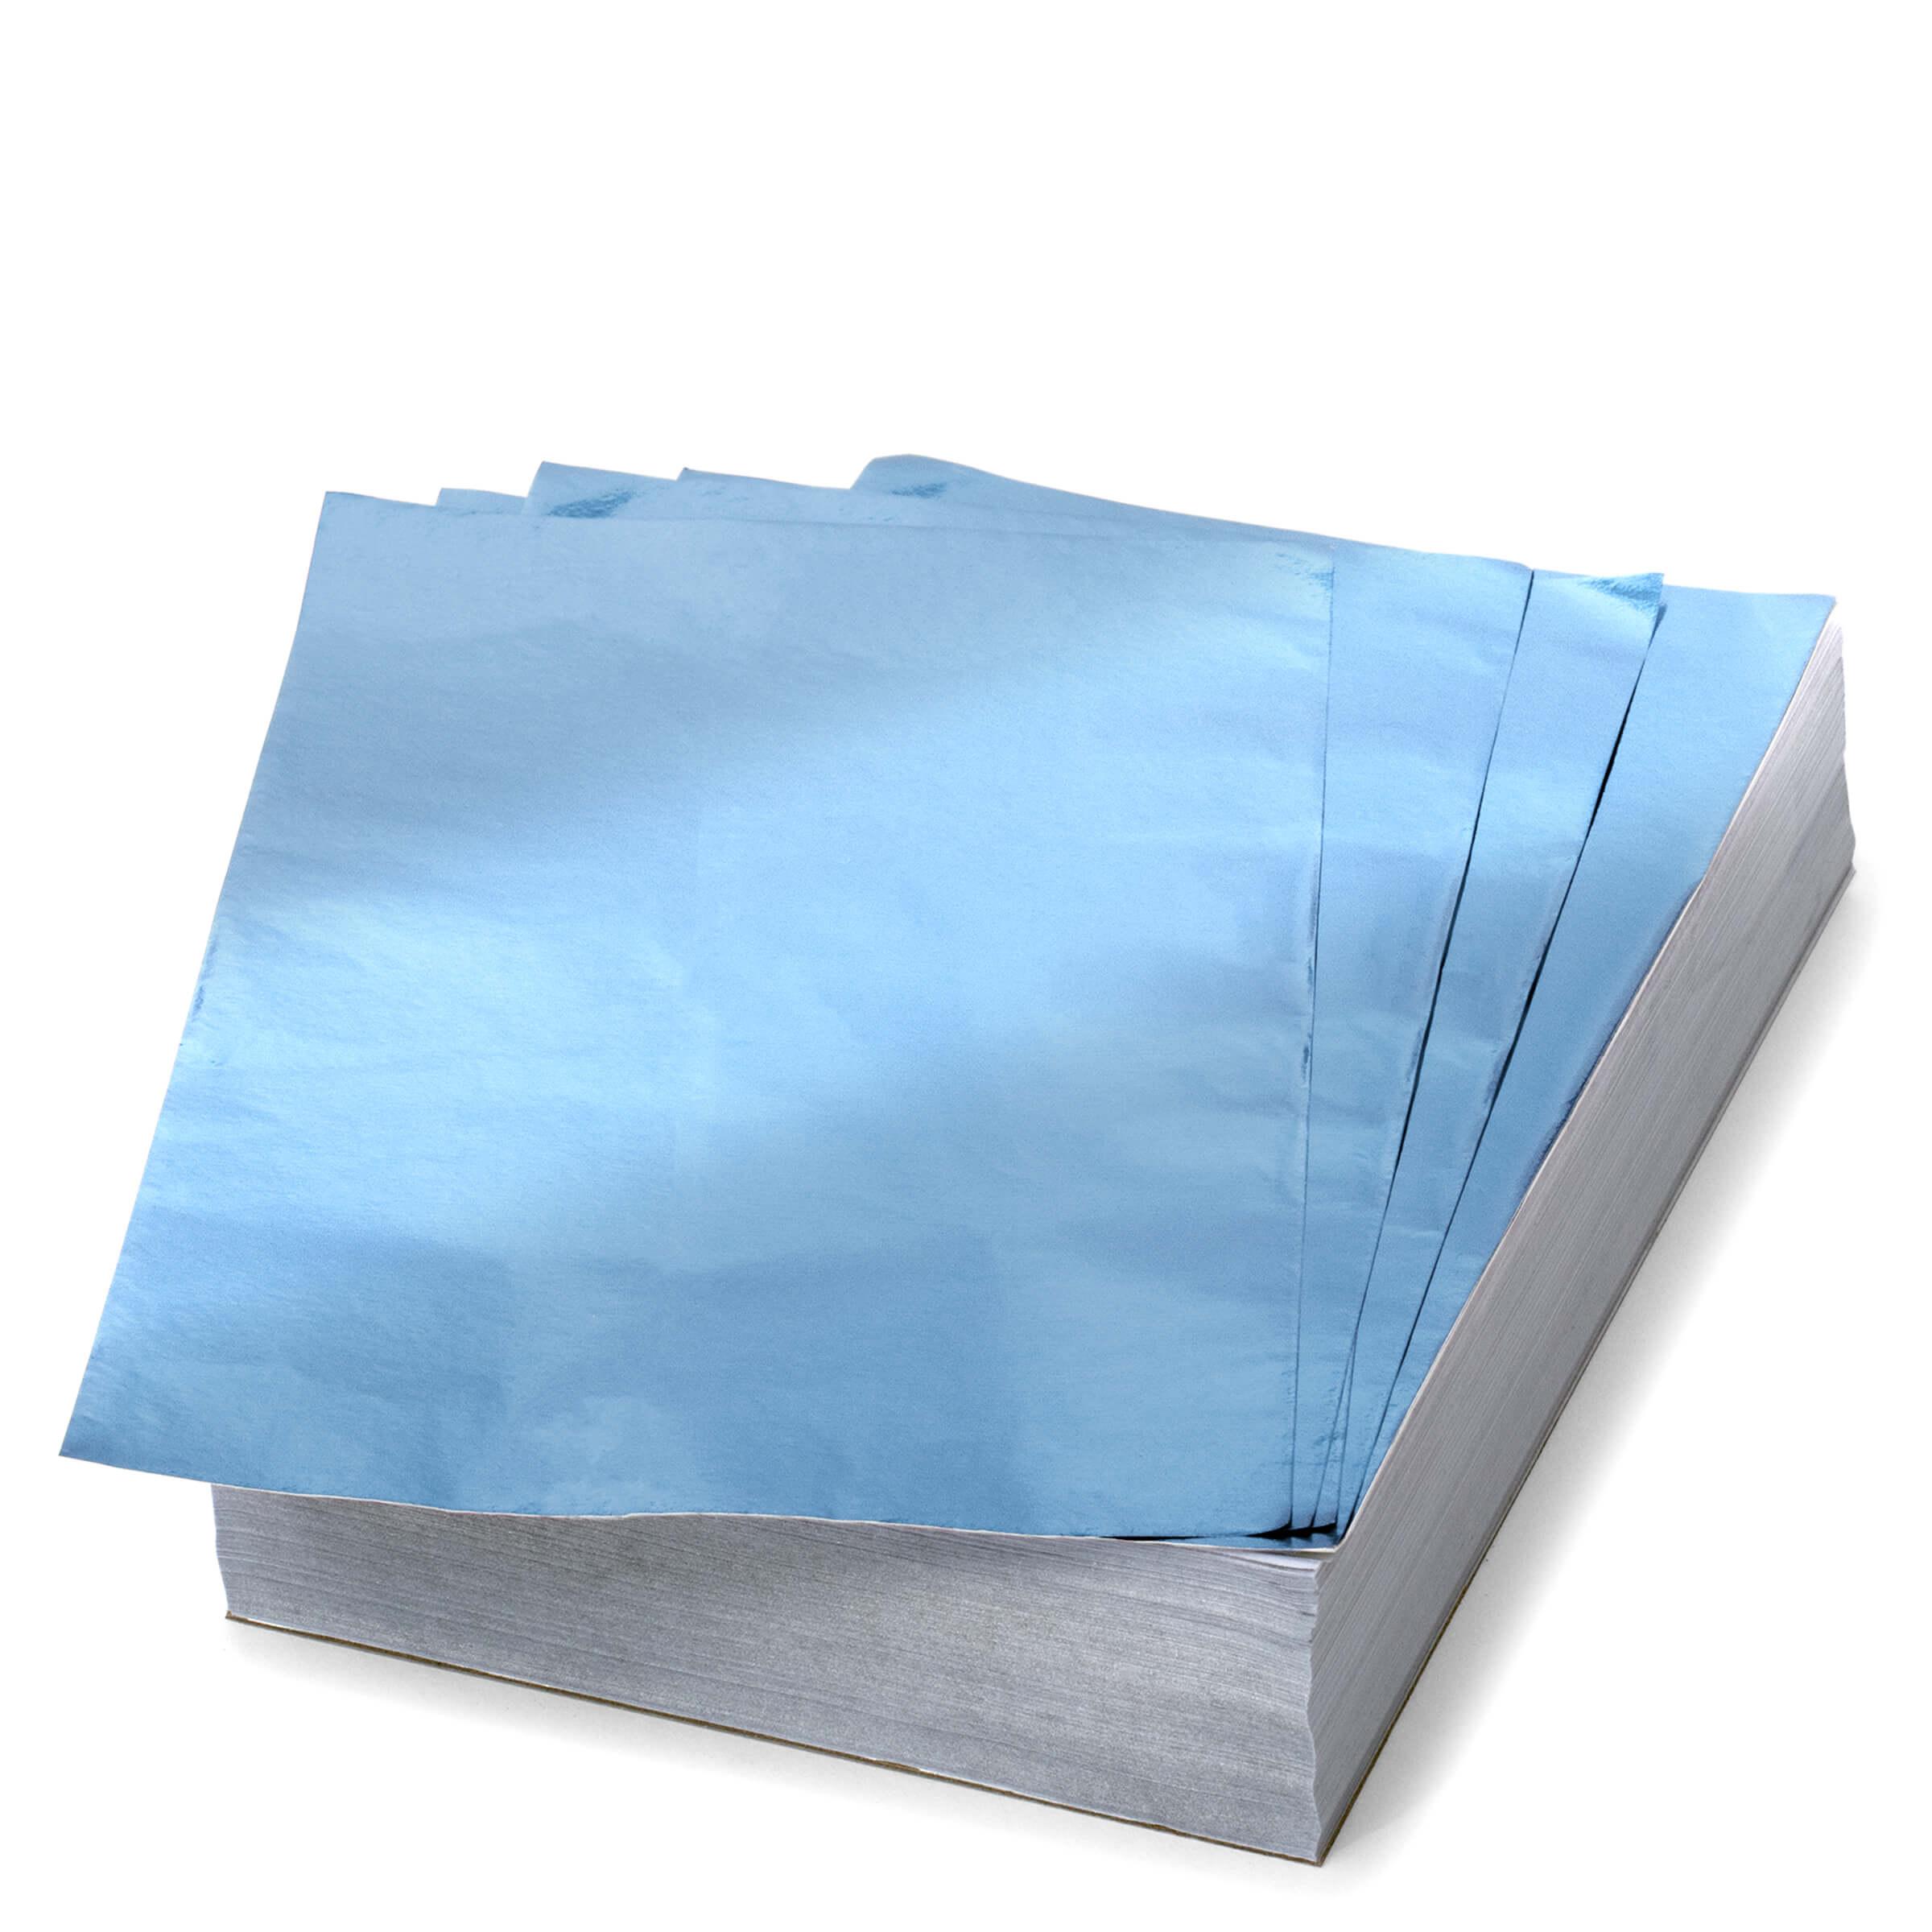 AL-58-60LB-a-5x8-smooth-foil-medium-light-blue-l.jpg